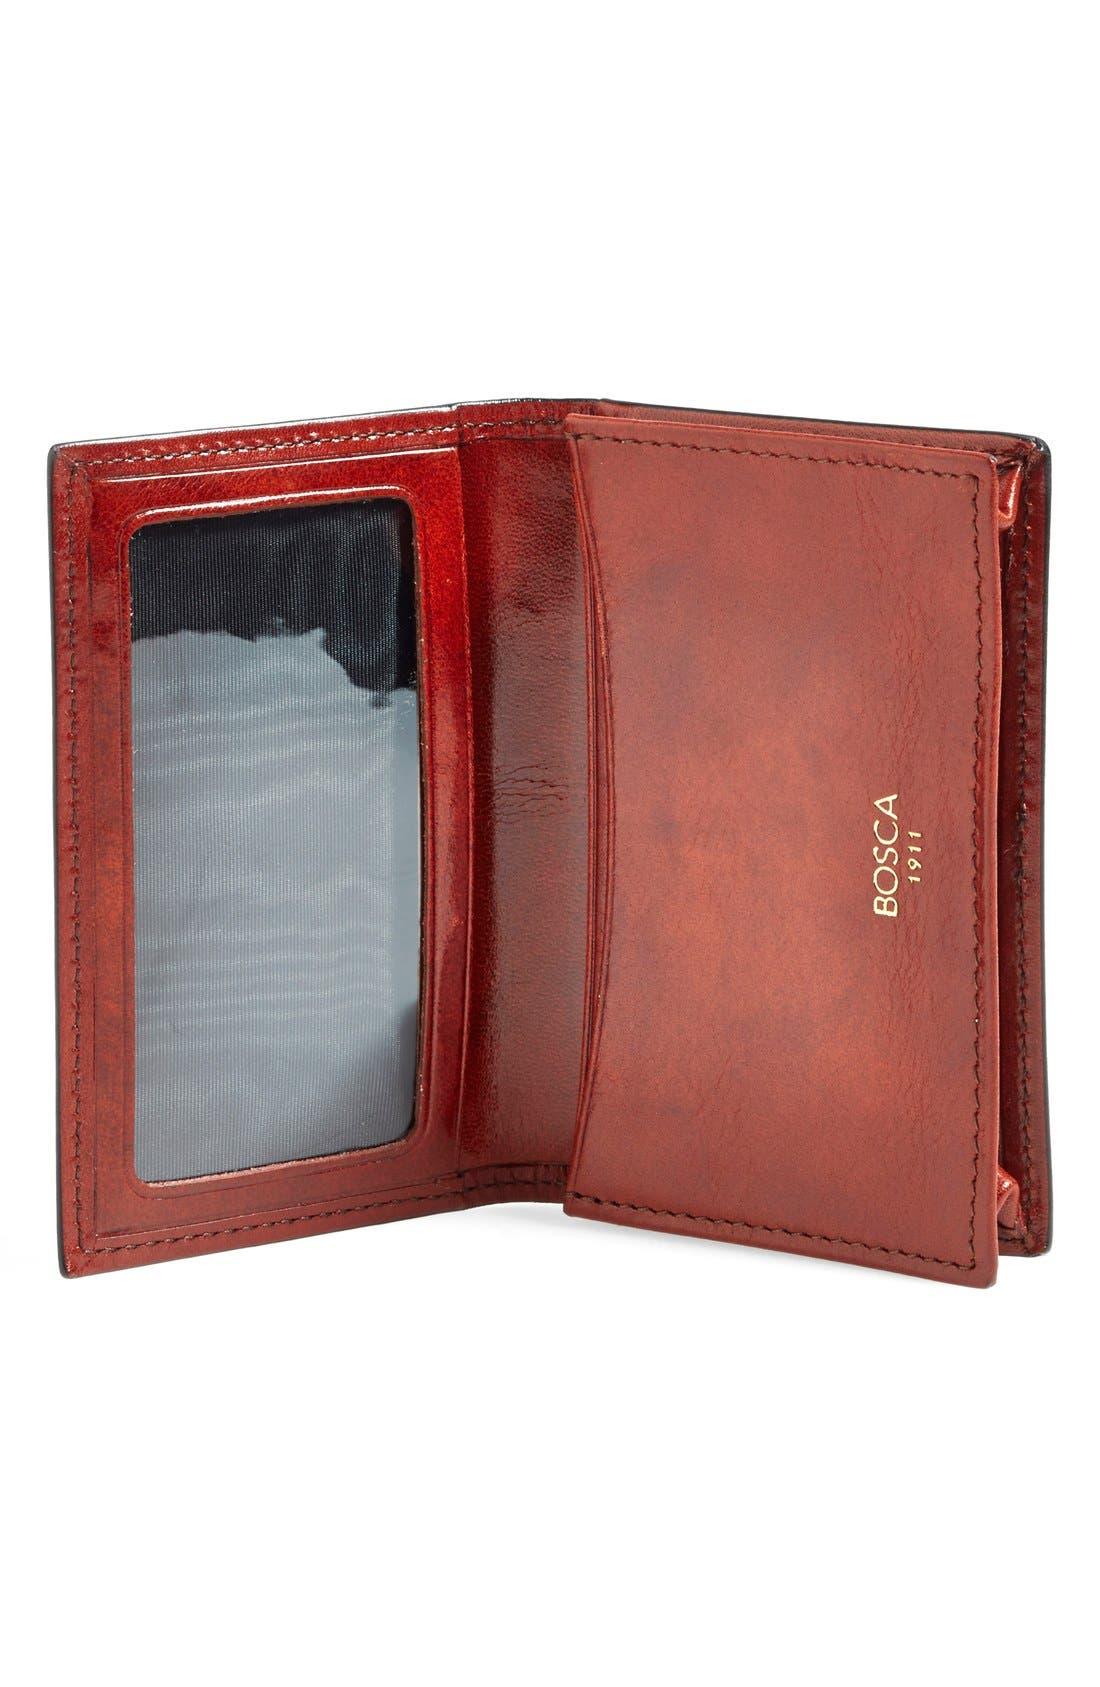 'Old Leather' Gusset Wallet,                             Alternate thumbnail 3, color,                             COGNAC